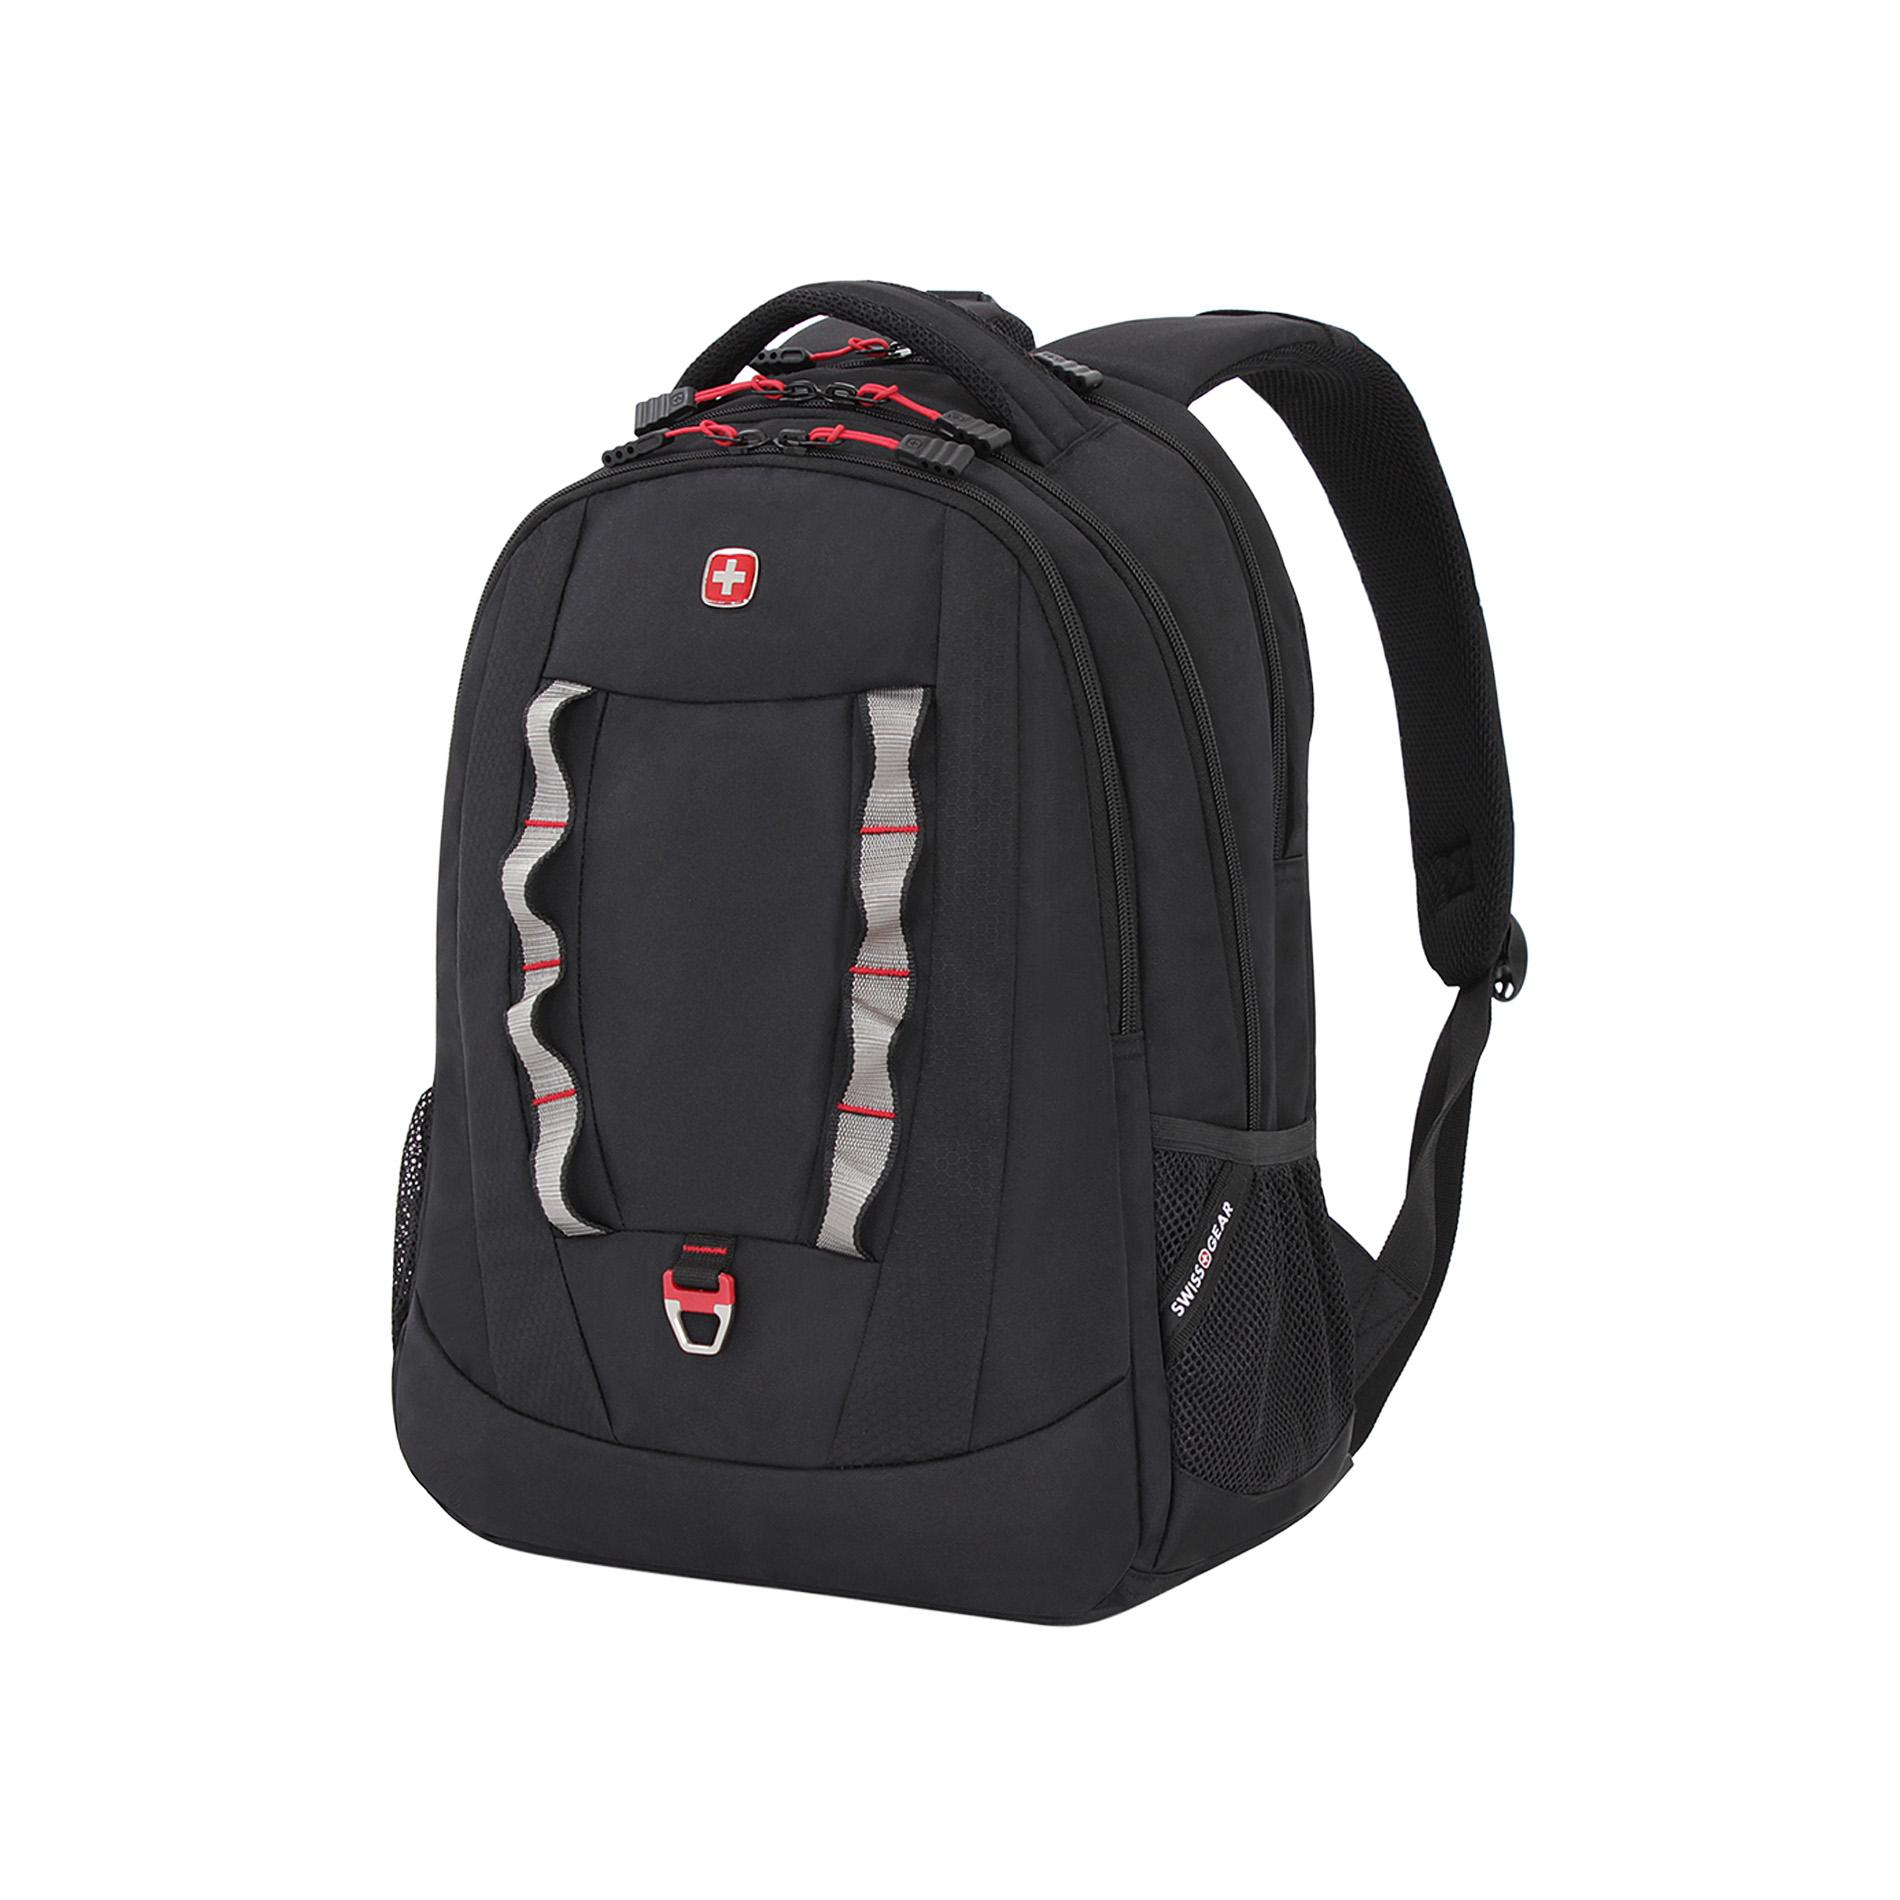 Swiss Gear Birs Laptop Backpack – Black/Red